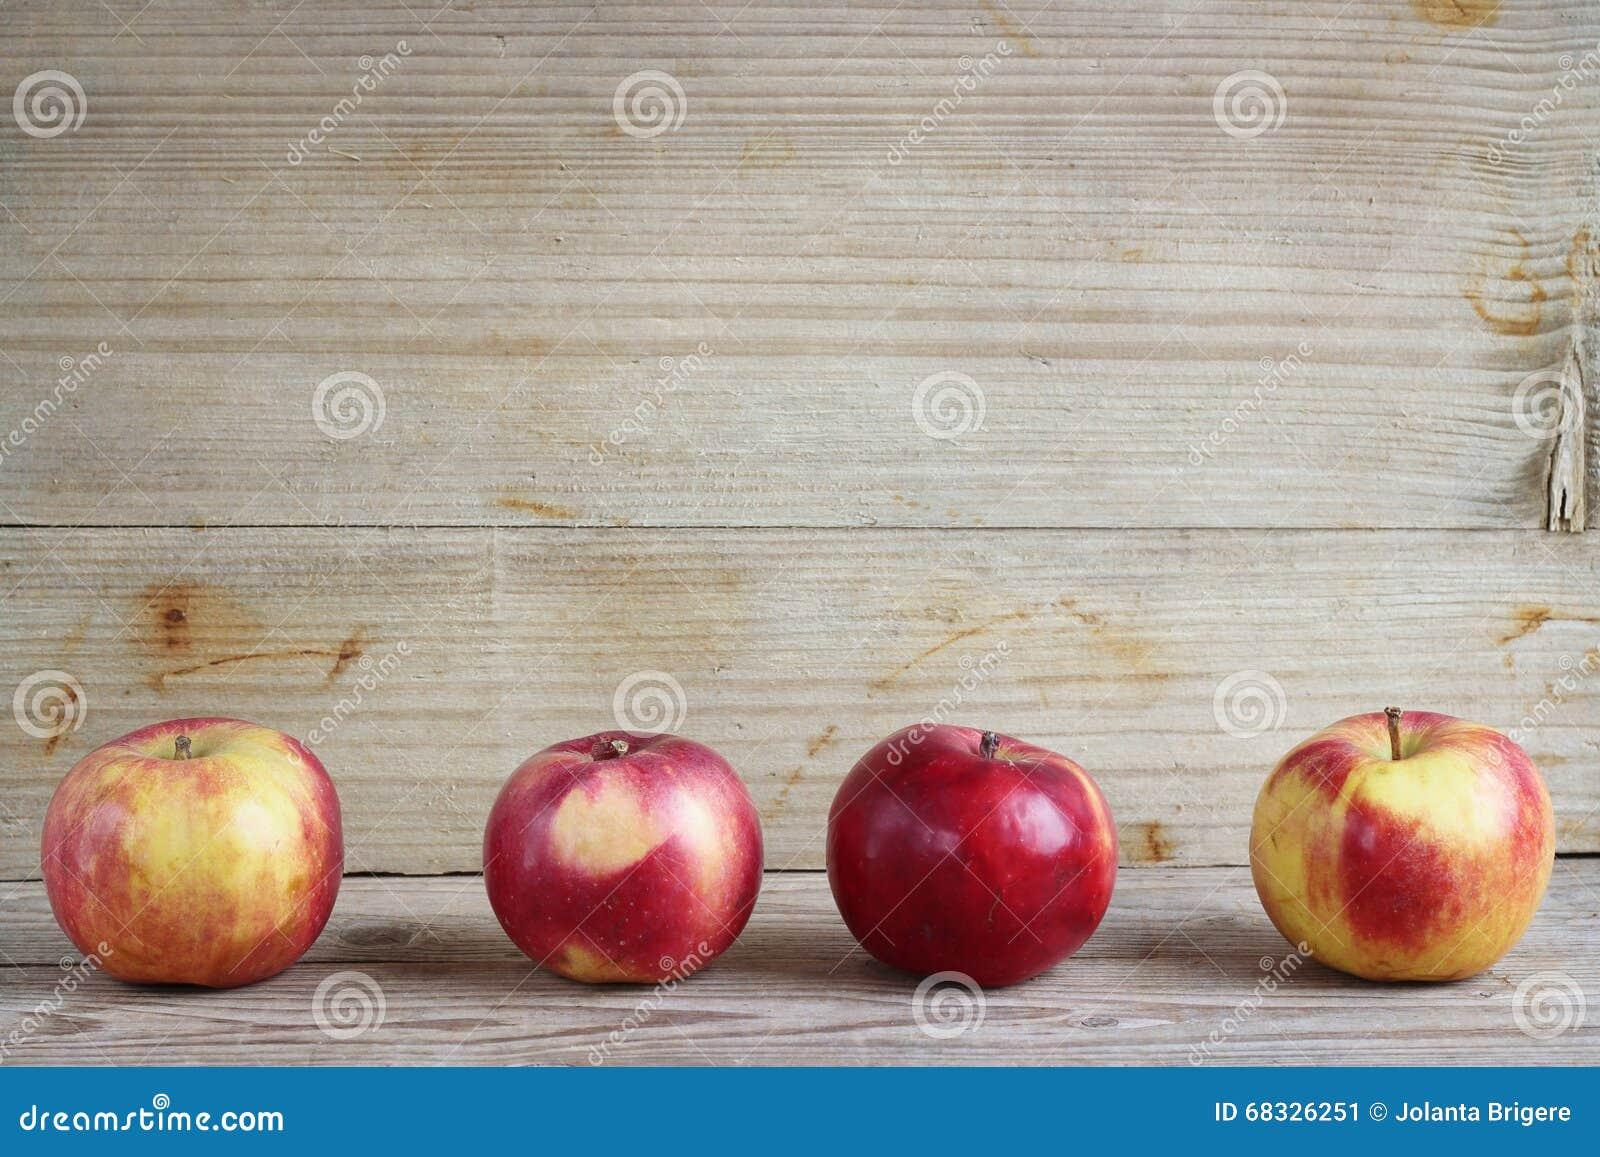 Vier appelen